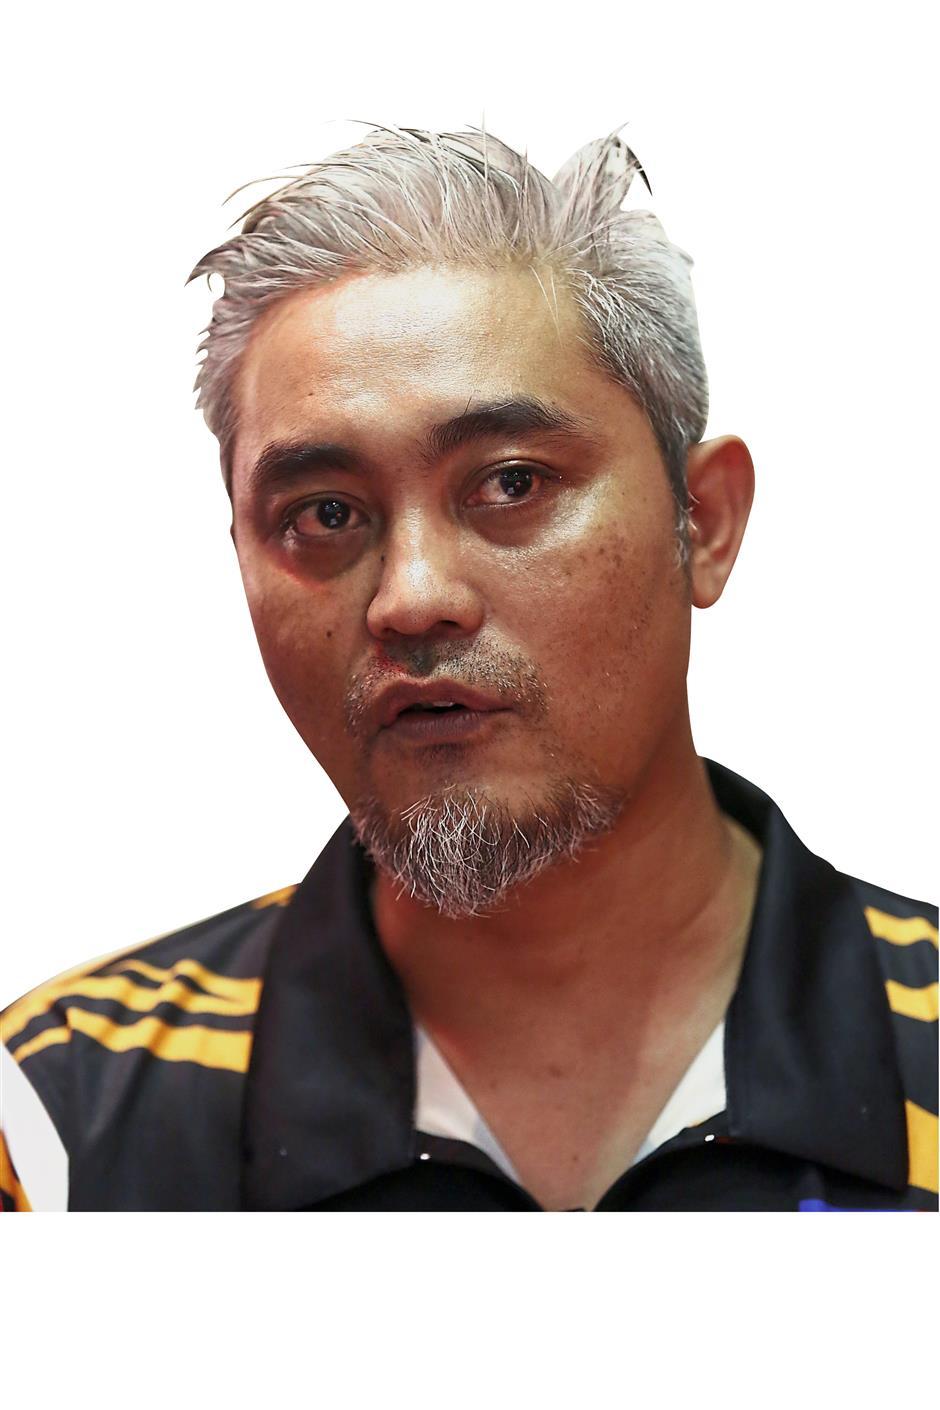 Apache Angels coach and Malaysias professional darter Rosidi Puasa was proud of his trainee. IZZRAFIQ ALIAS / The Star. February 4, 2018.